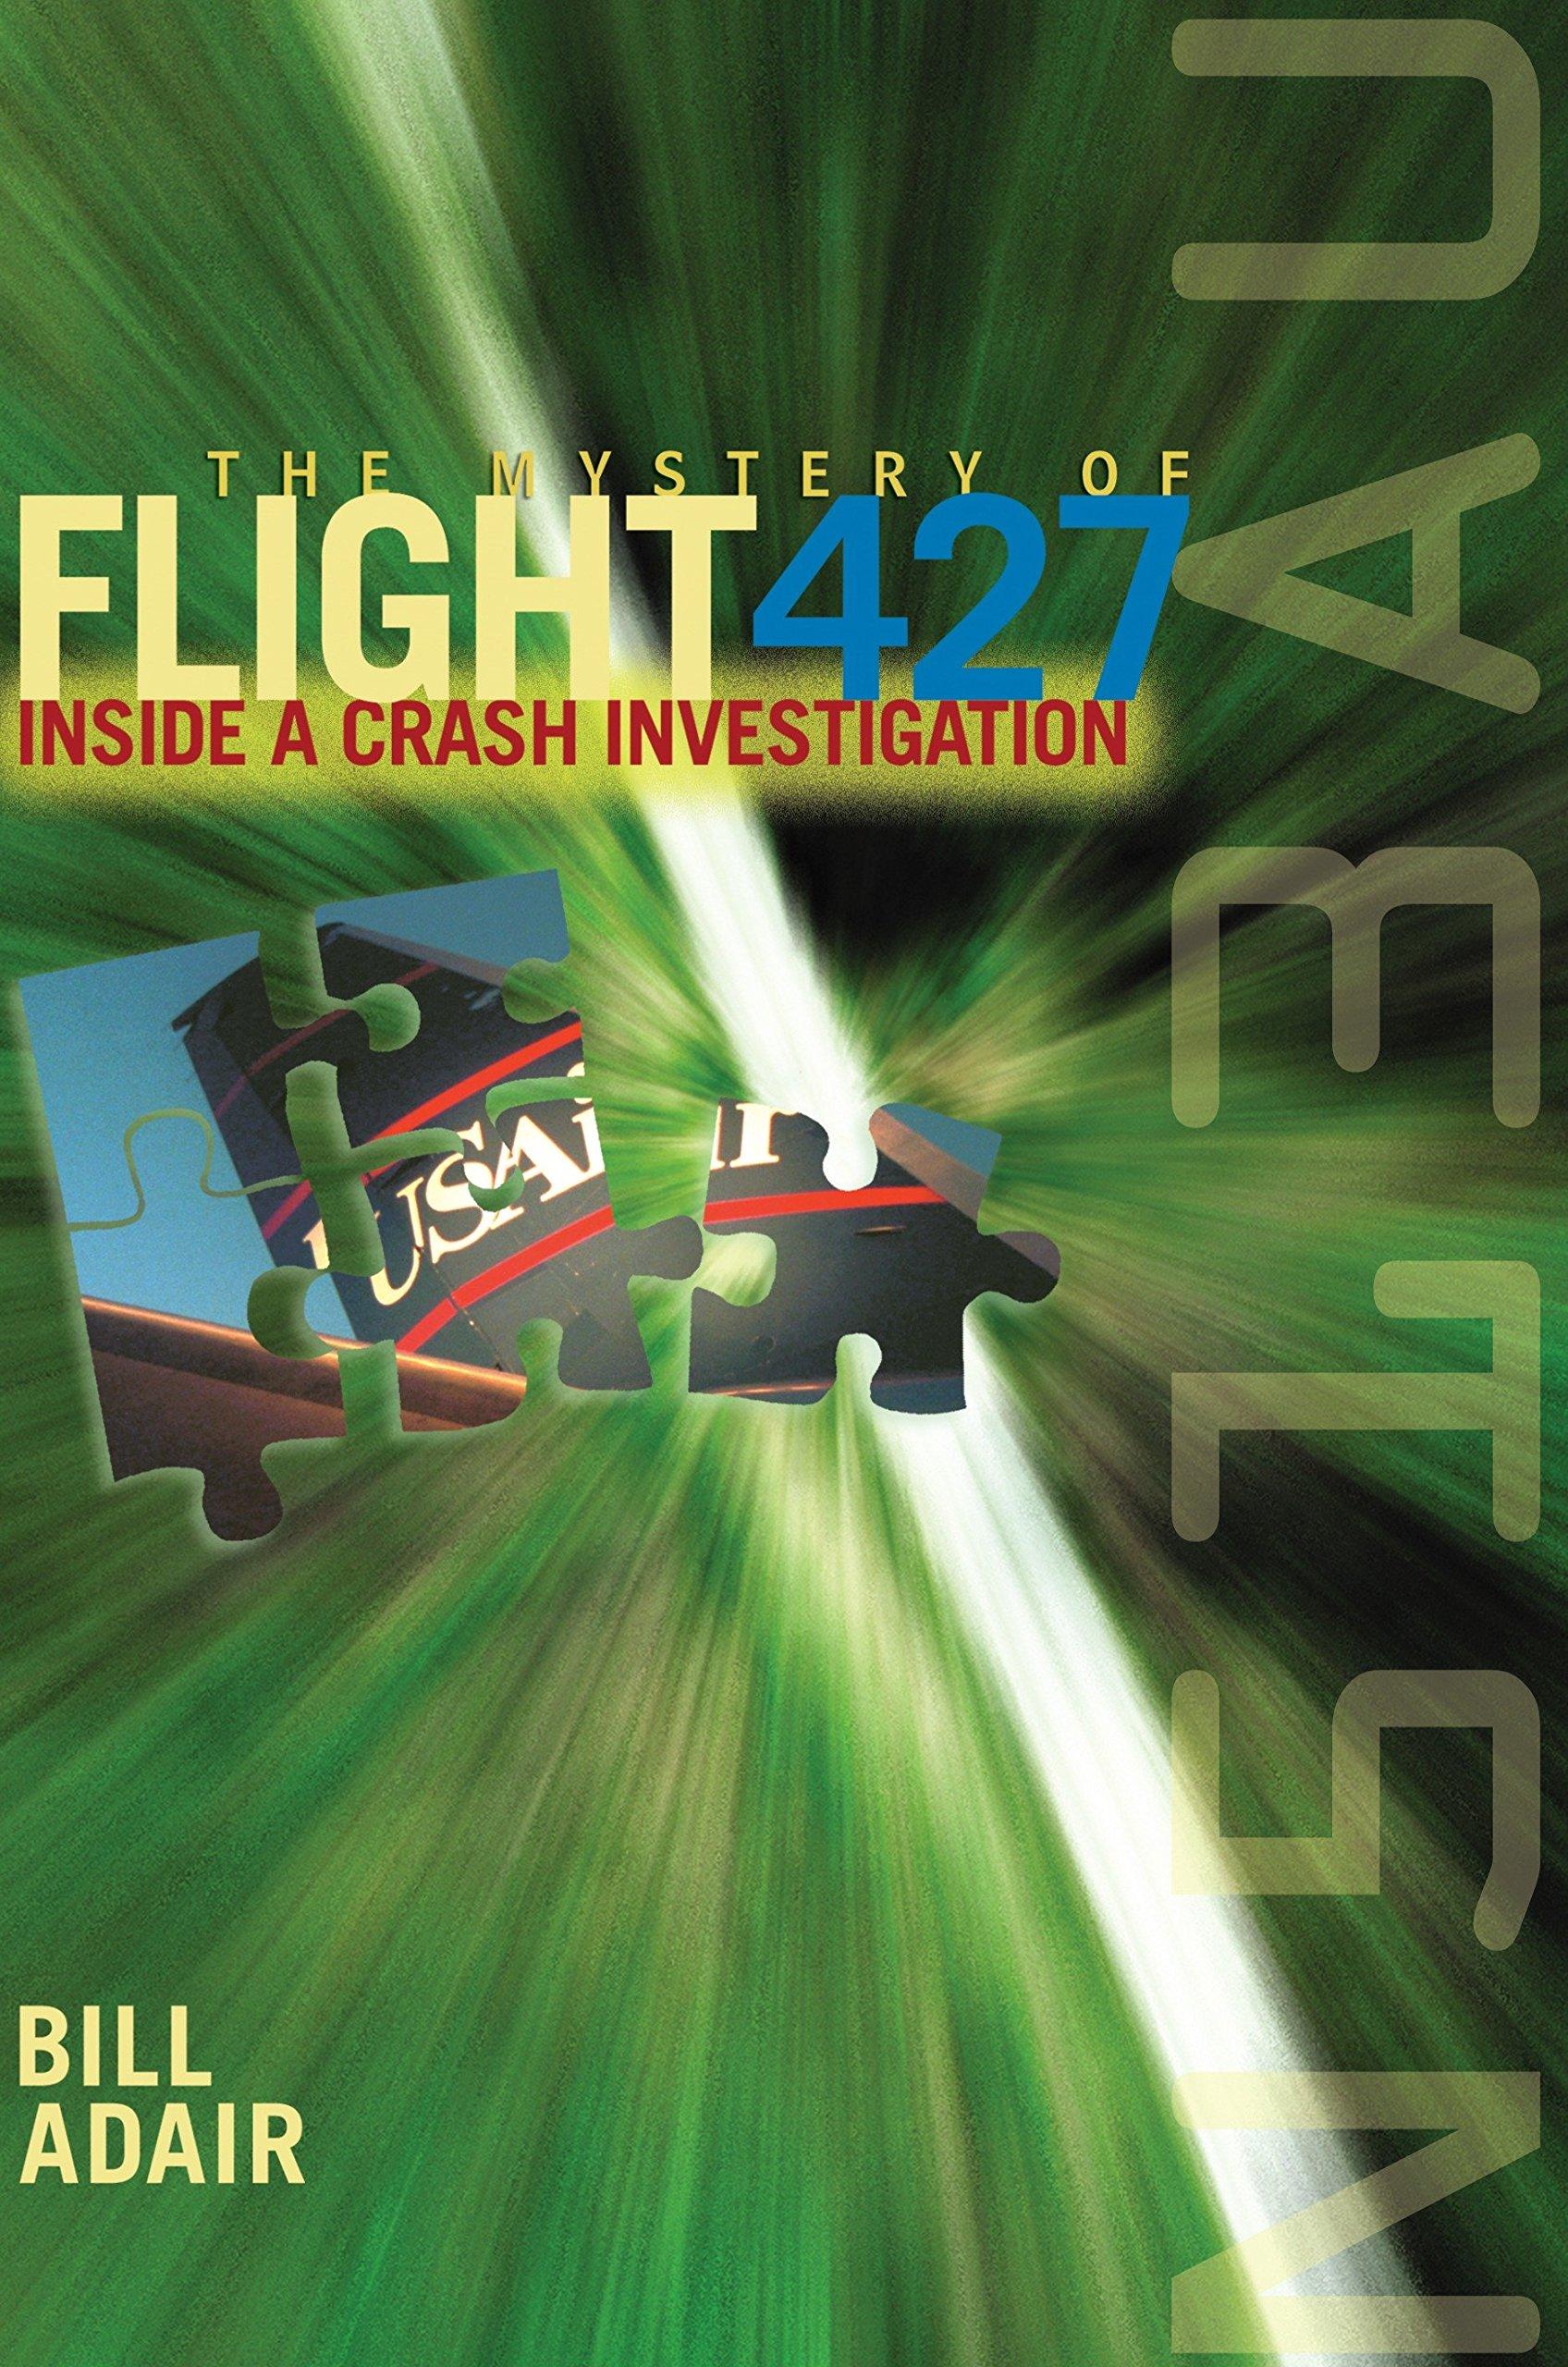 The Mystery of Flight 427: Inside a Crash Investigation